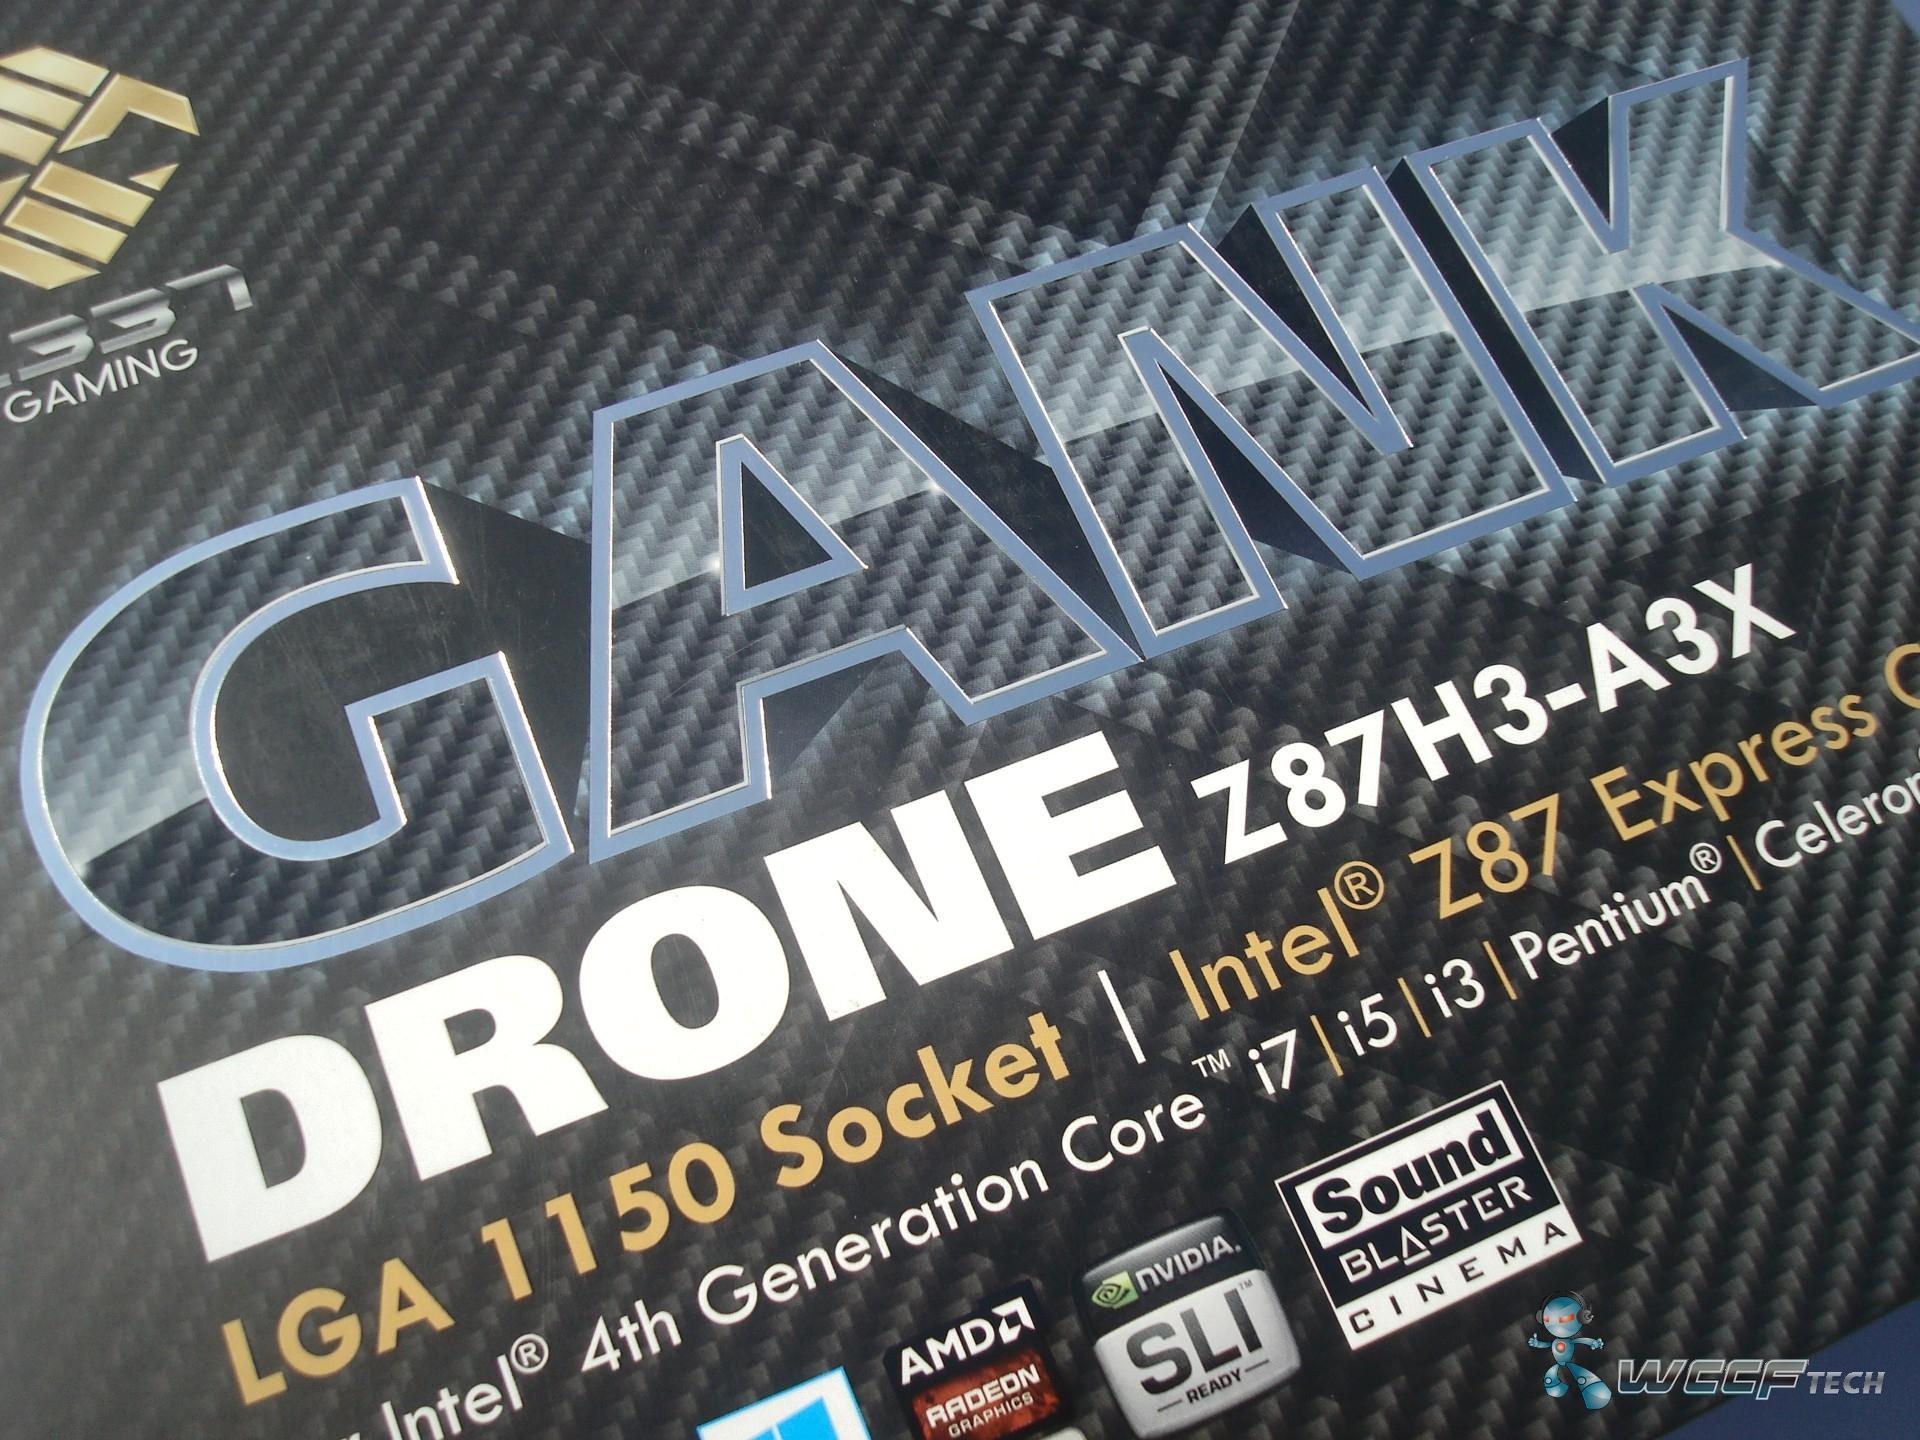 ecs-gank-drone-custom